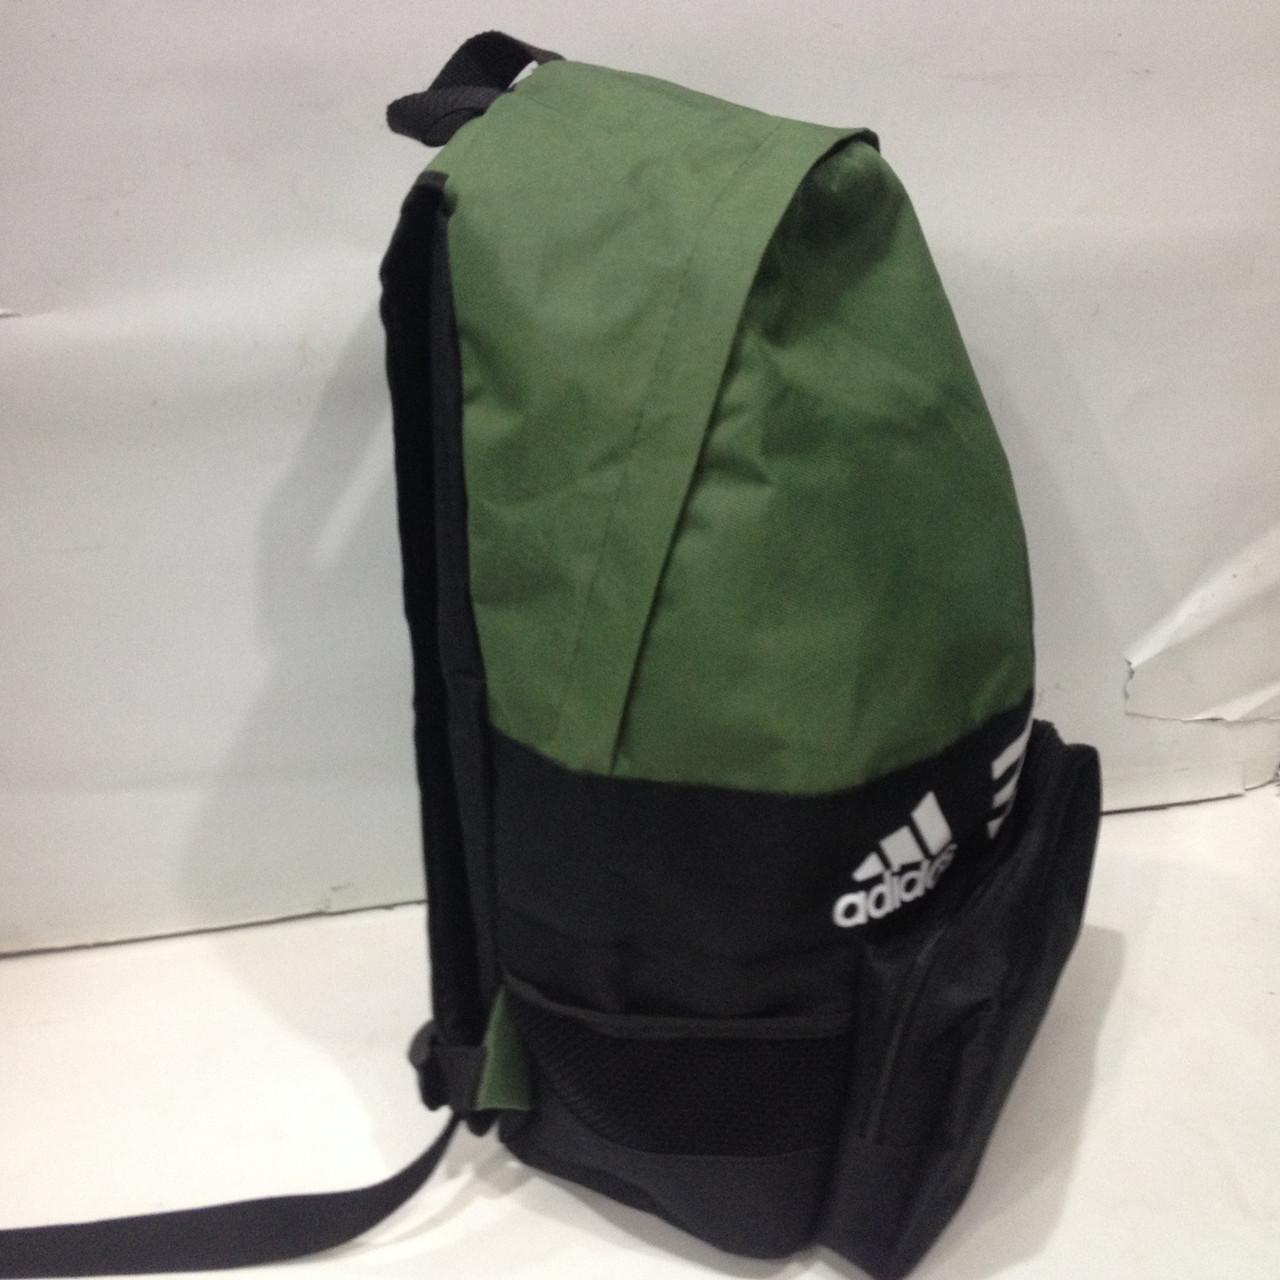 Спортивные сумки и рюкзаки оптом сибспортшоп.ру рюкзаки мужские